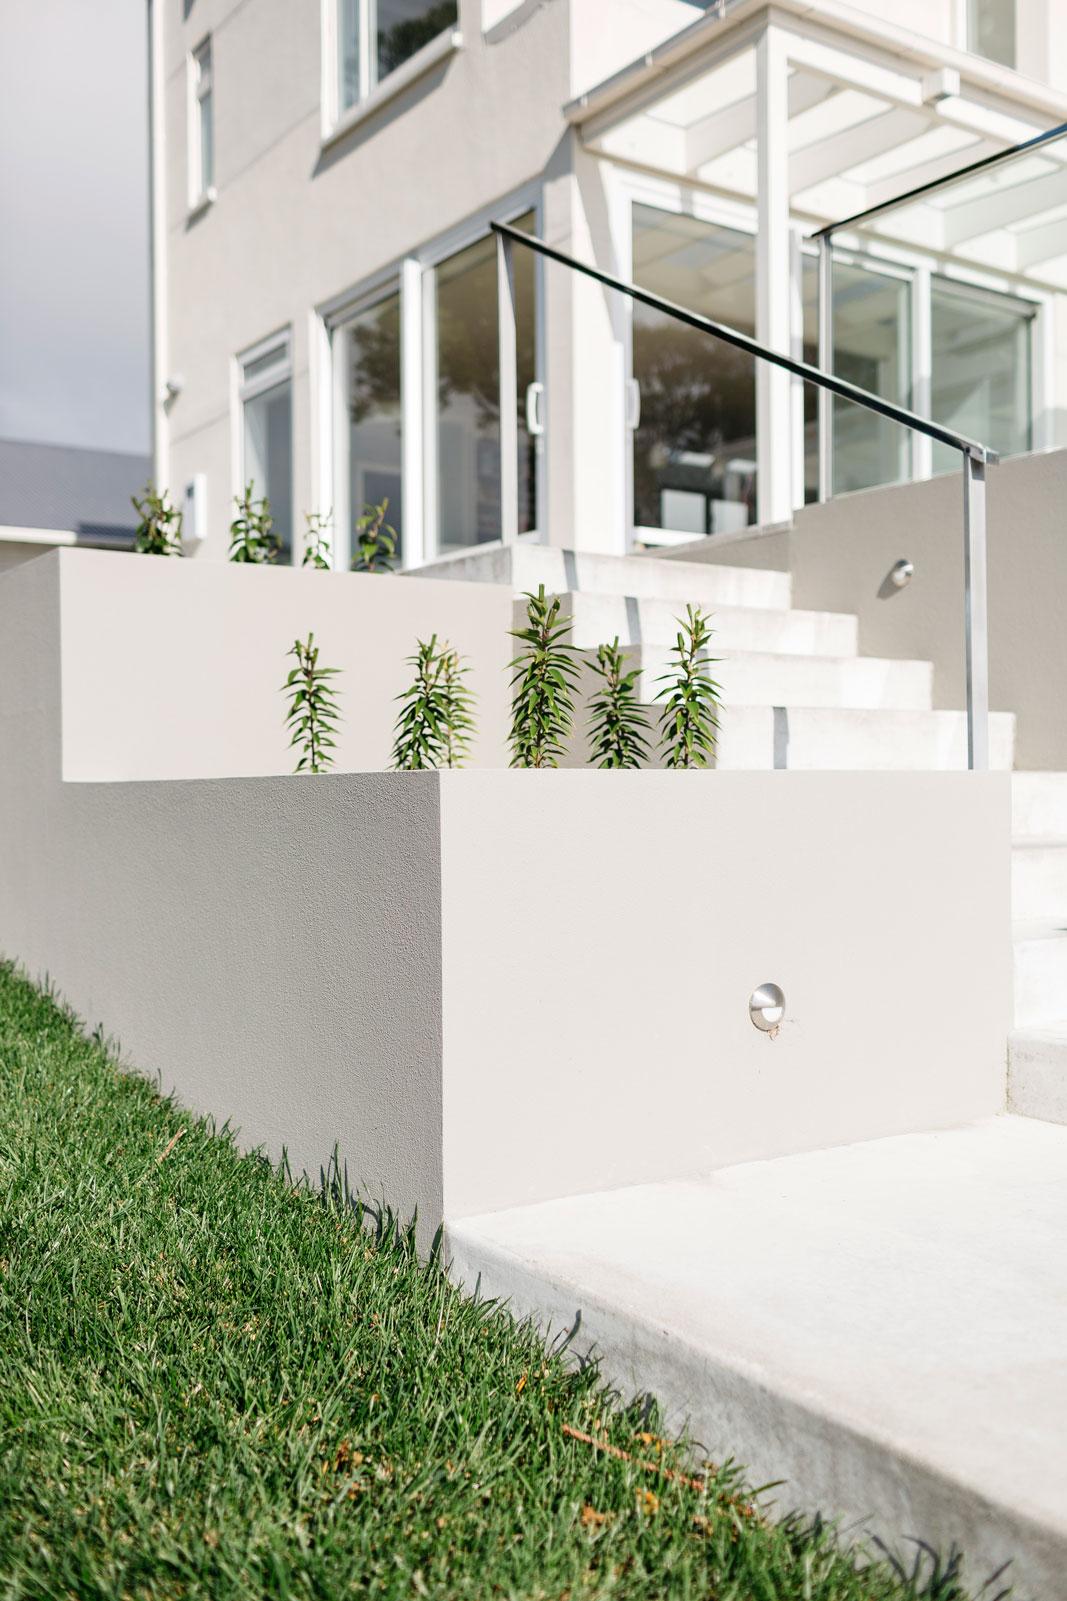 Plastering Landscape Walls